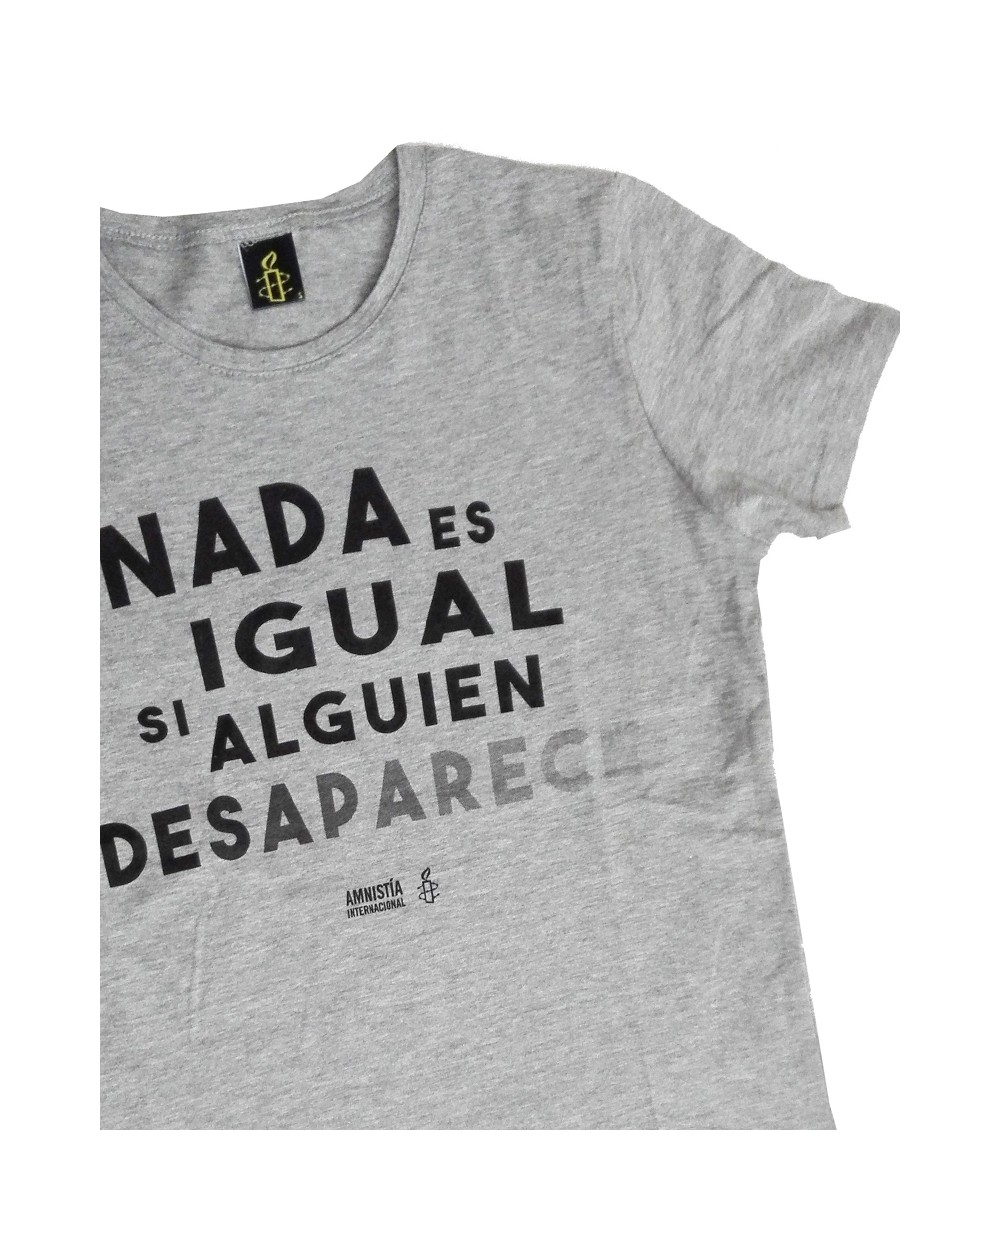 Camiseta desaparecidos mujer Amnistía Internacional